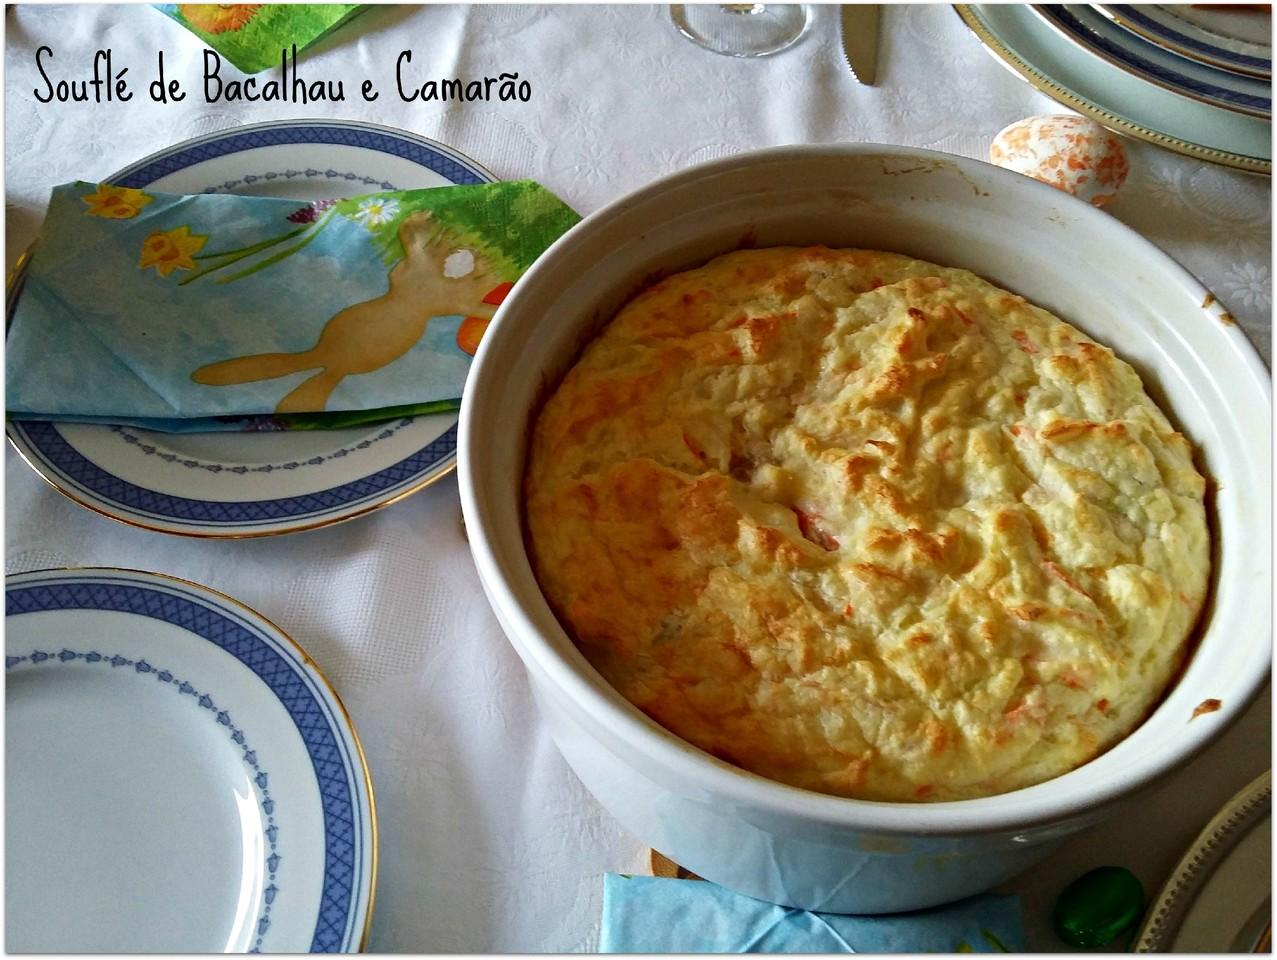 soufle de camarão.jpg